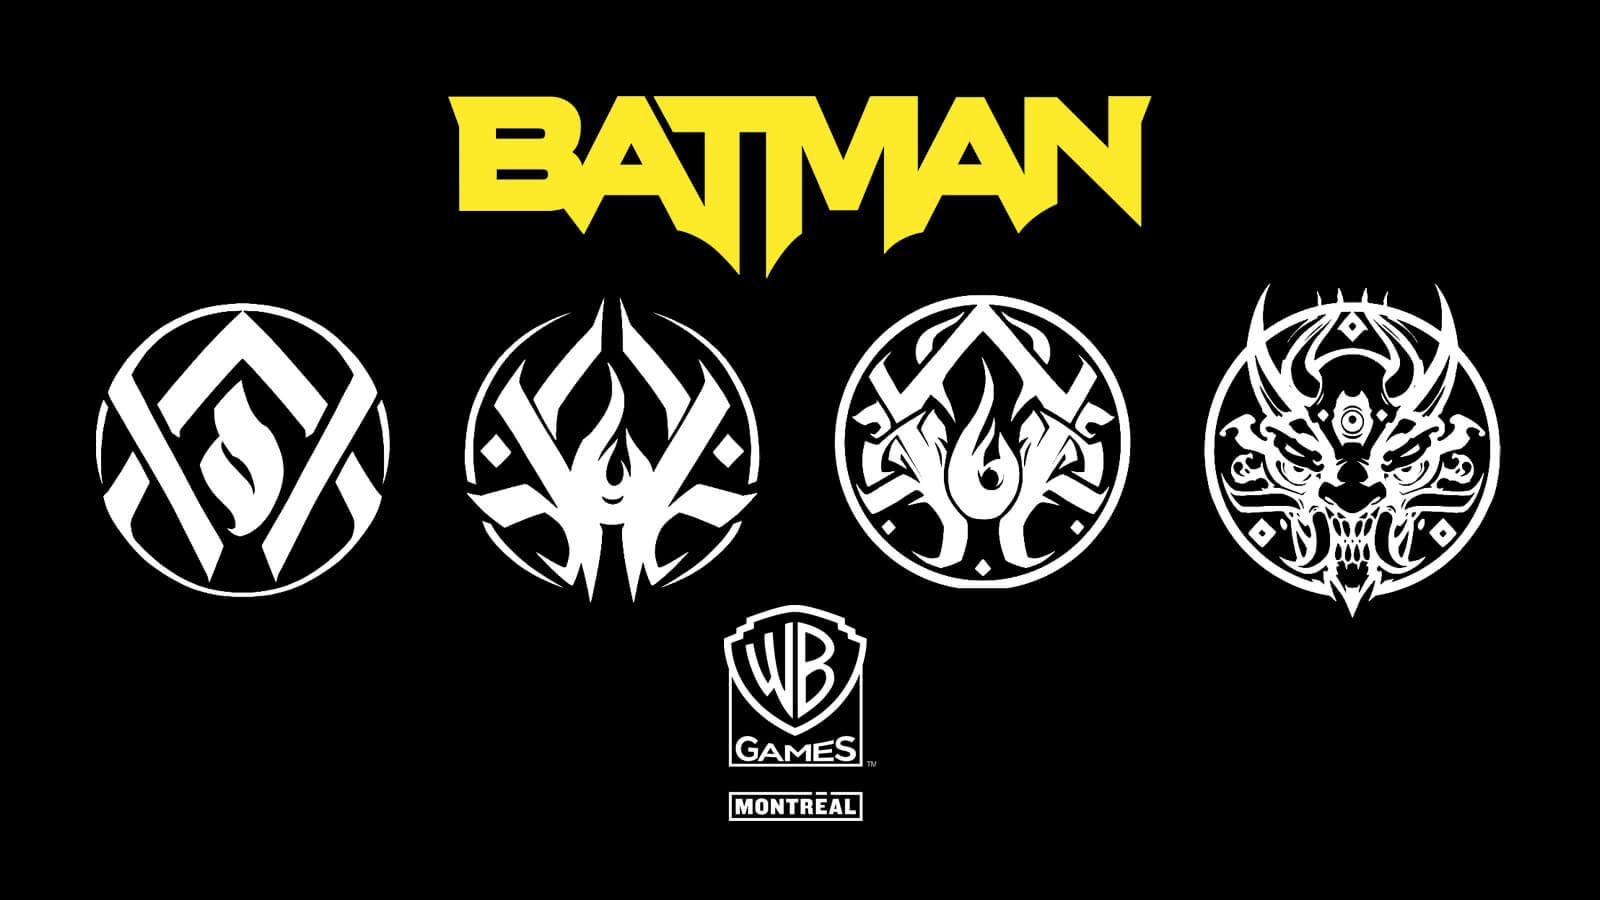 Batman: Court of Owls Game Teased By WB Montréal.